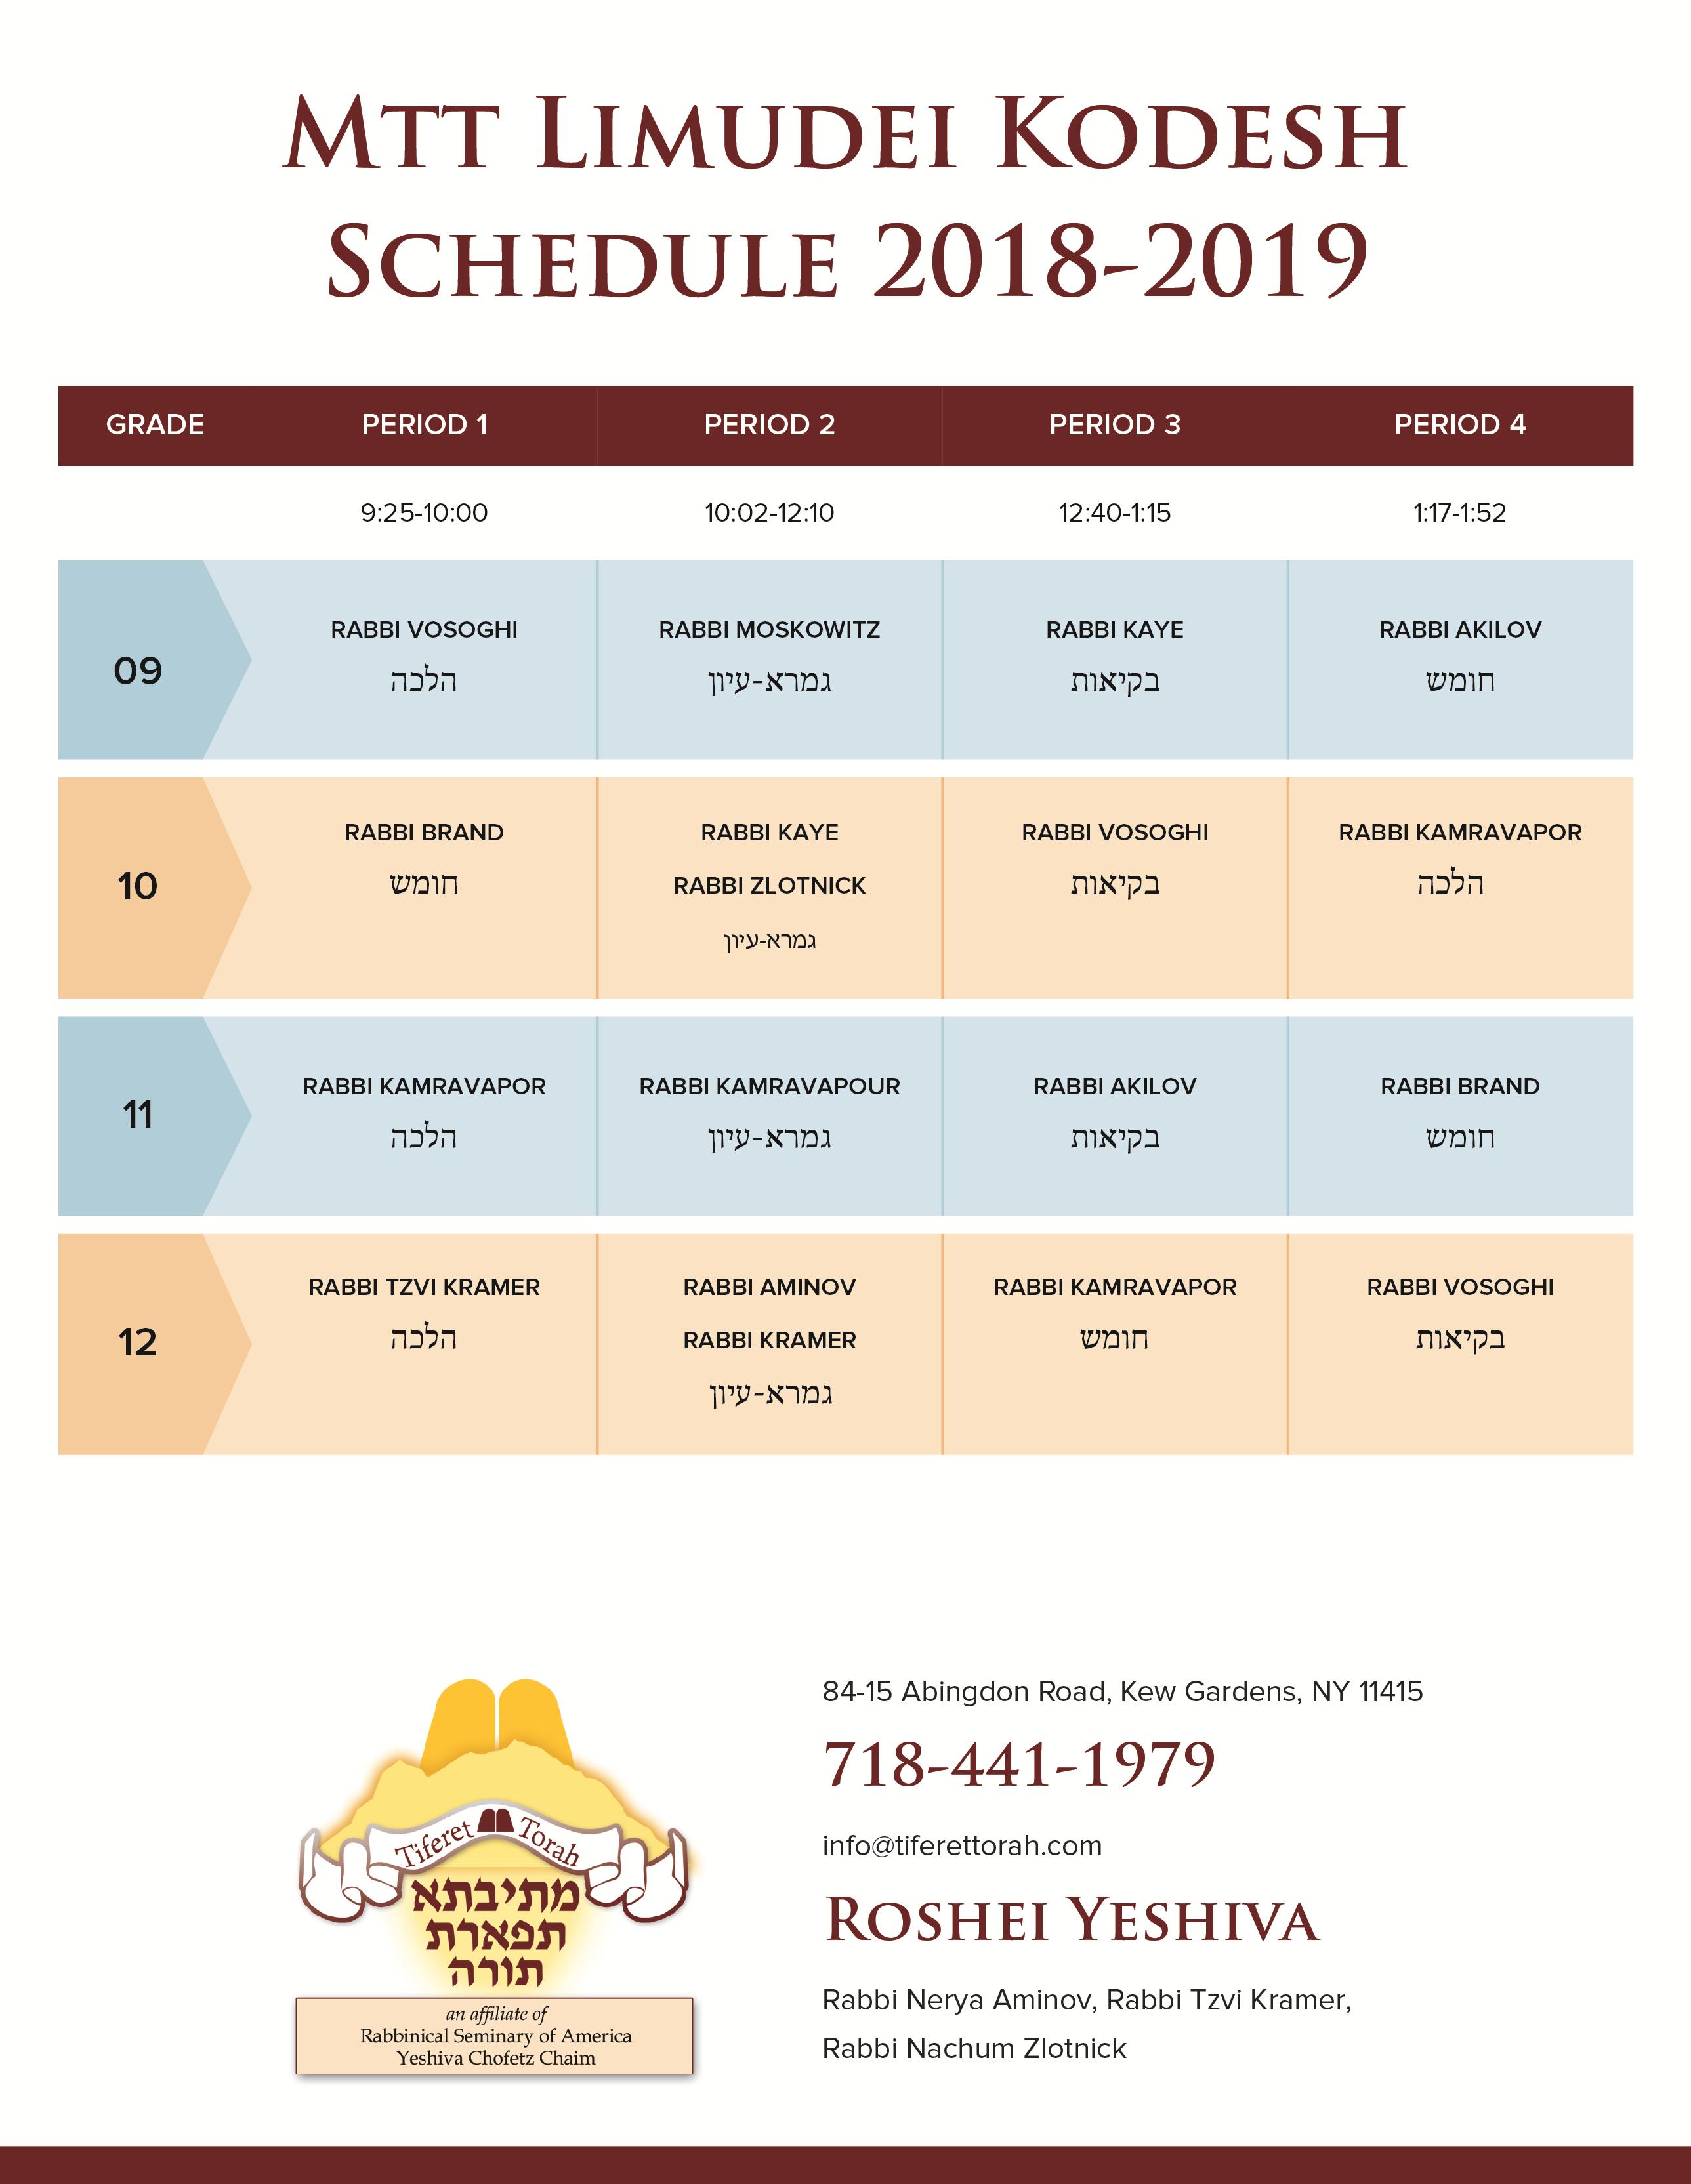 MTT - limudei kodesh schedule